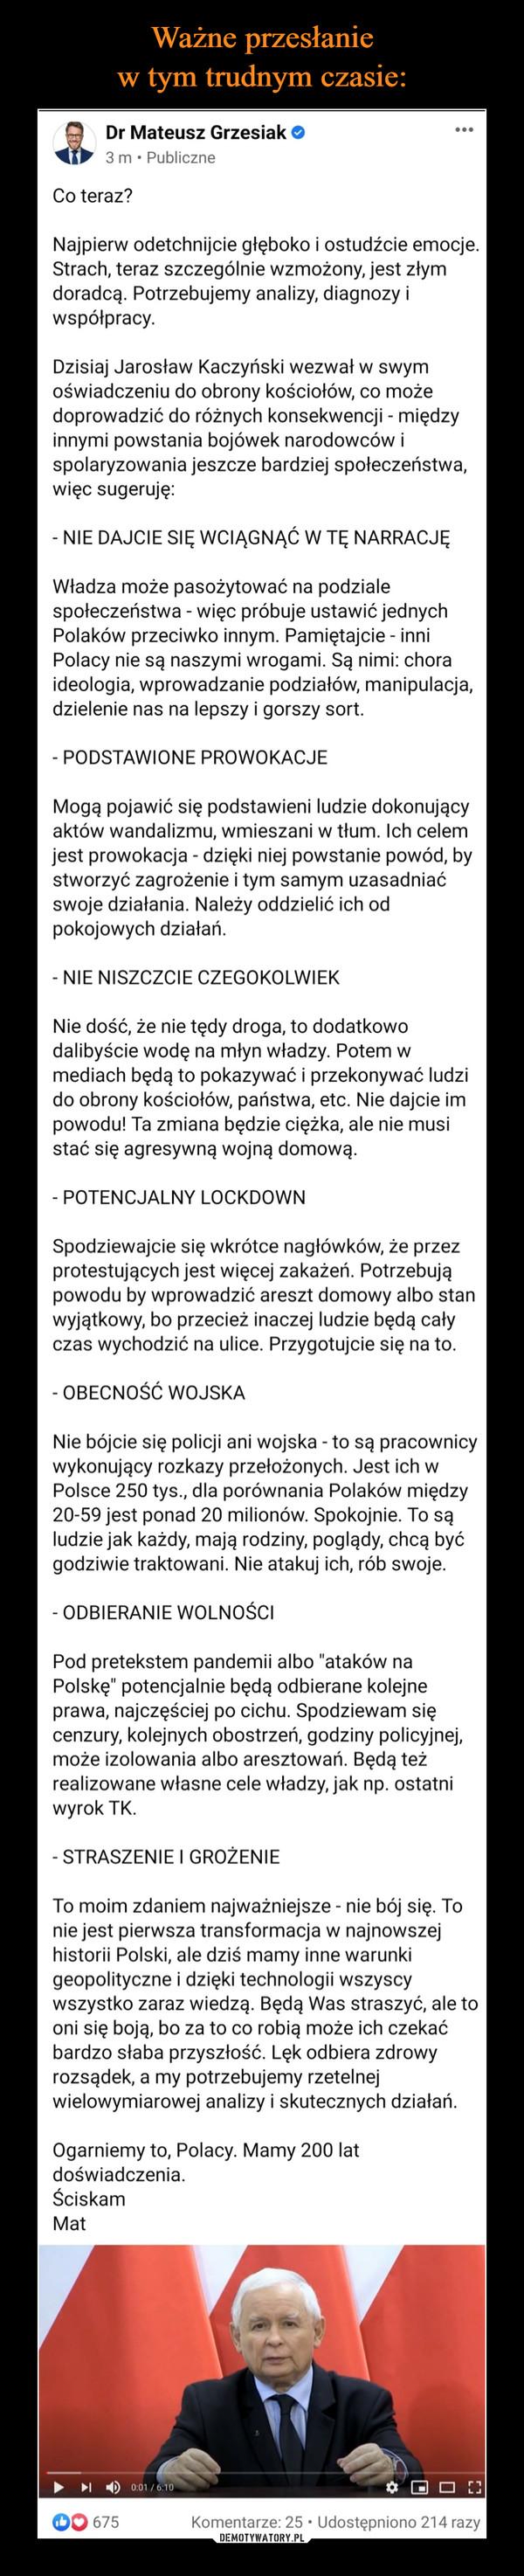 https://img3.dmty.pl//uploads/202010/1603833630_m8bxxz_600.jpg